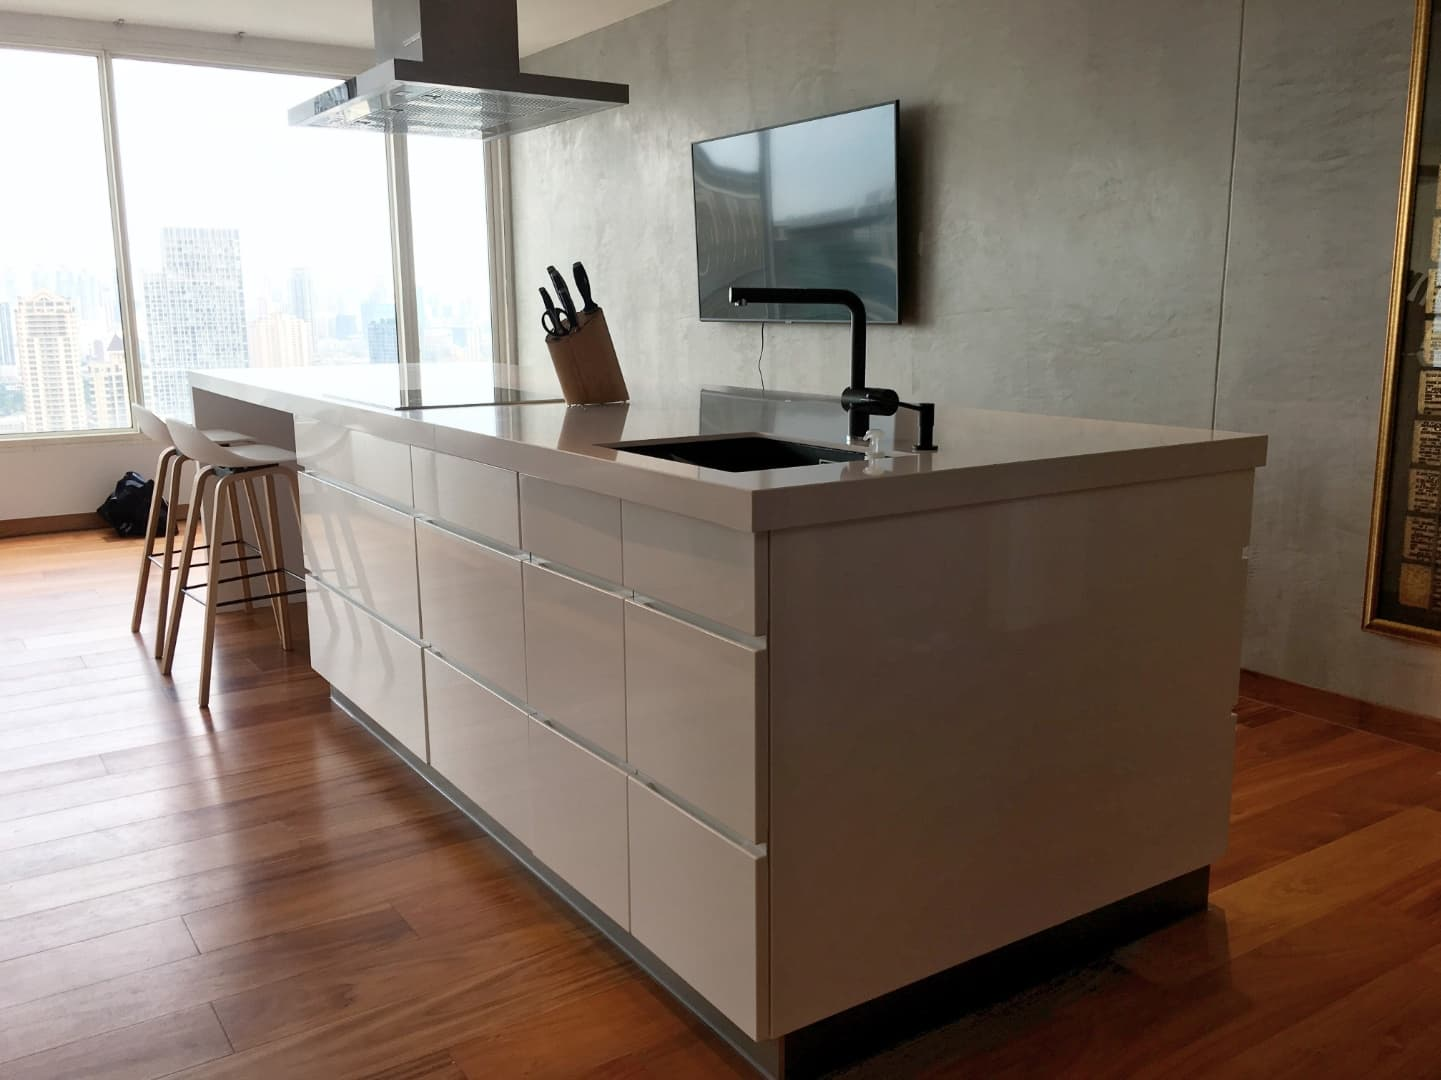 Mano Kitchen 2 Thonglor 3.JPG